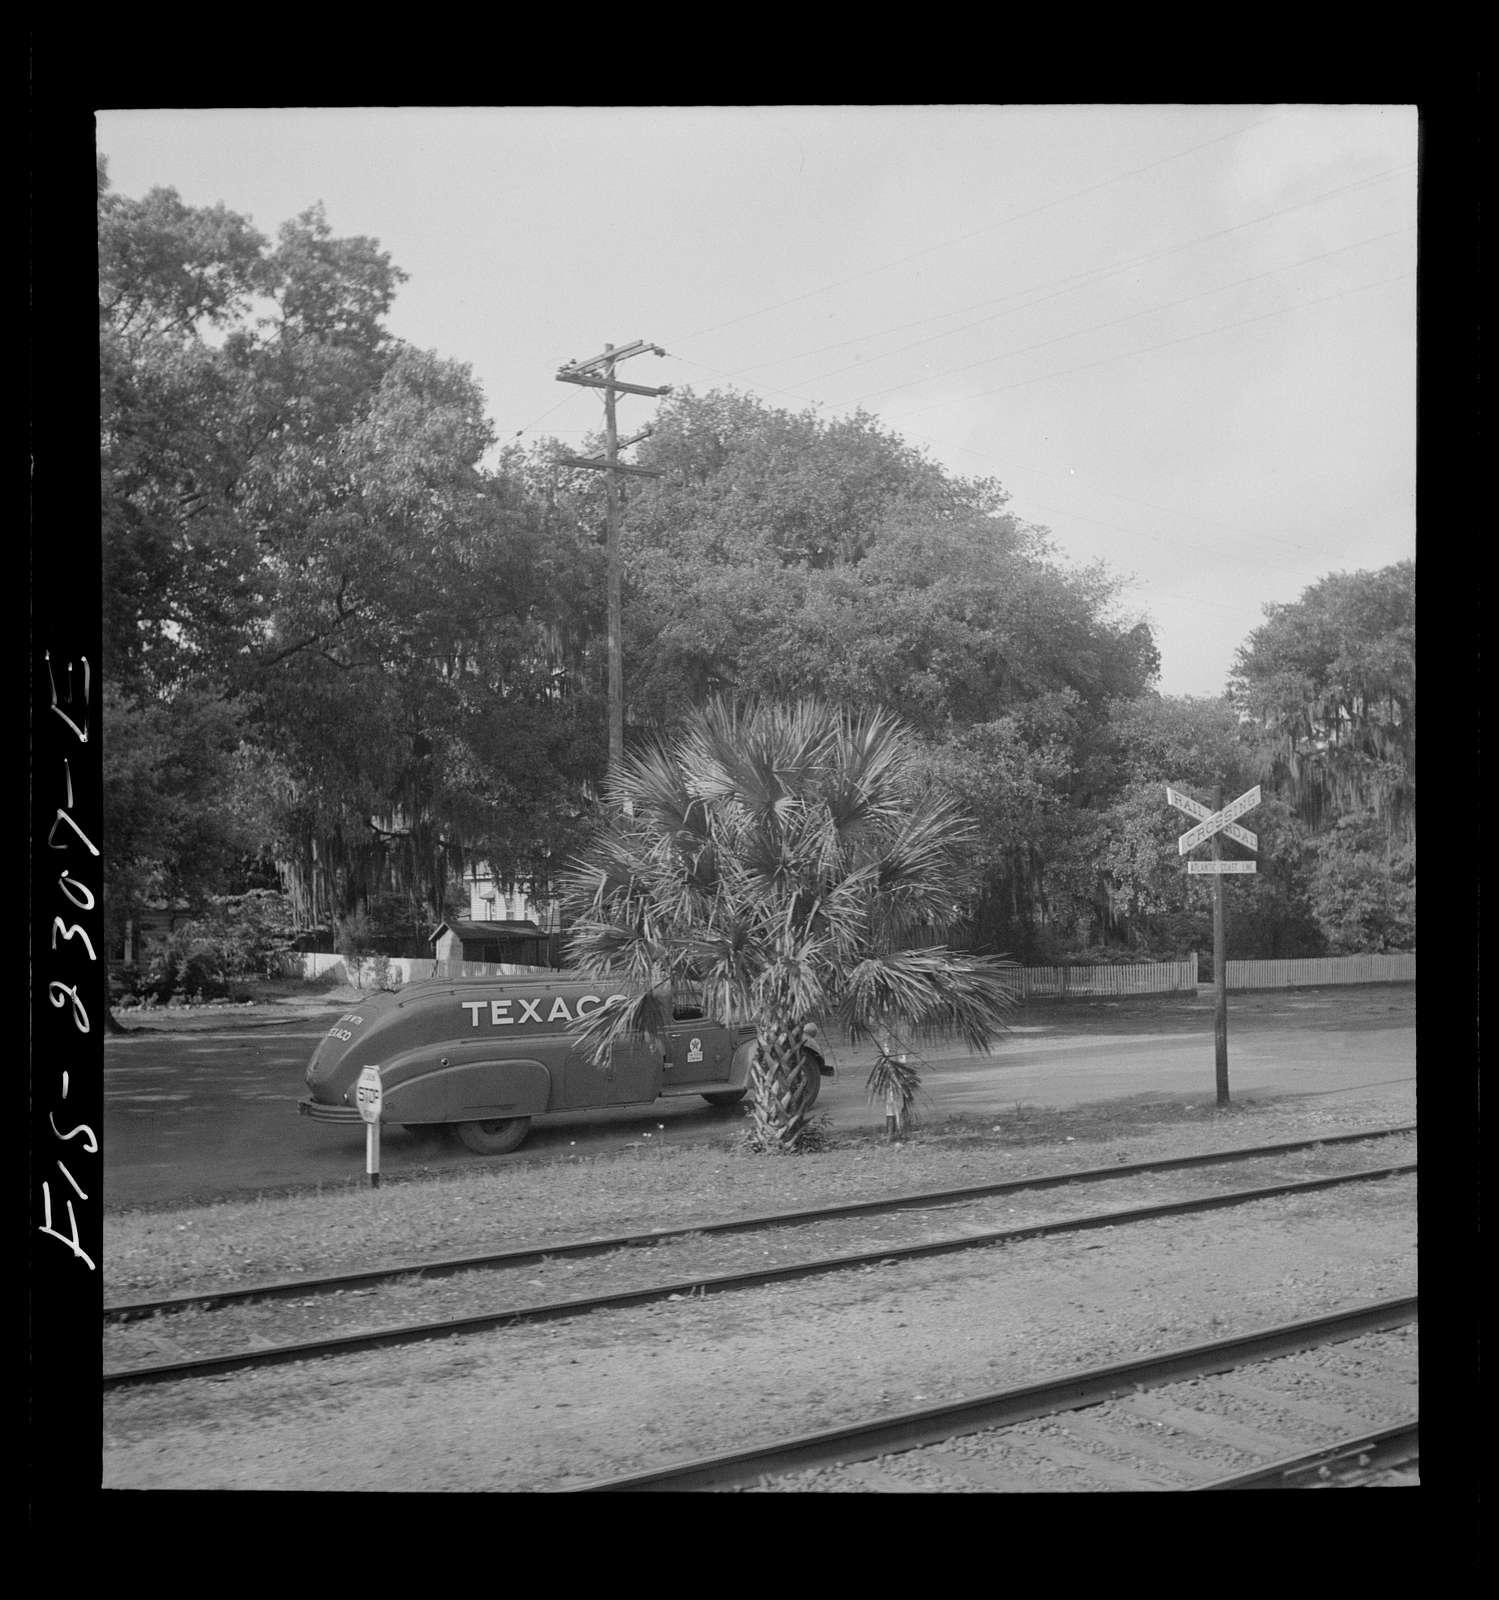 Parris Island, South Carolina. U.S. Marine Corps glider detachment training camp. A scene near the local railroad station